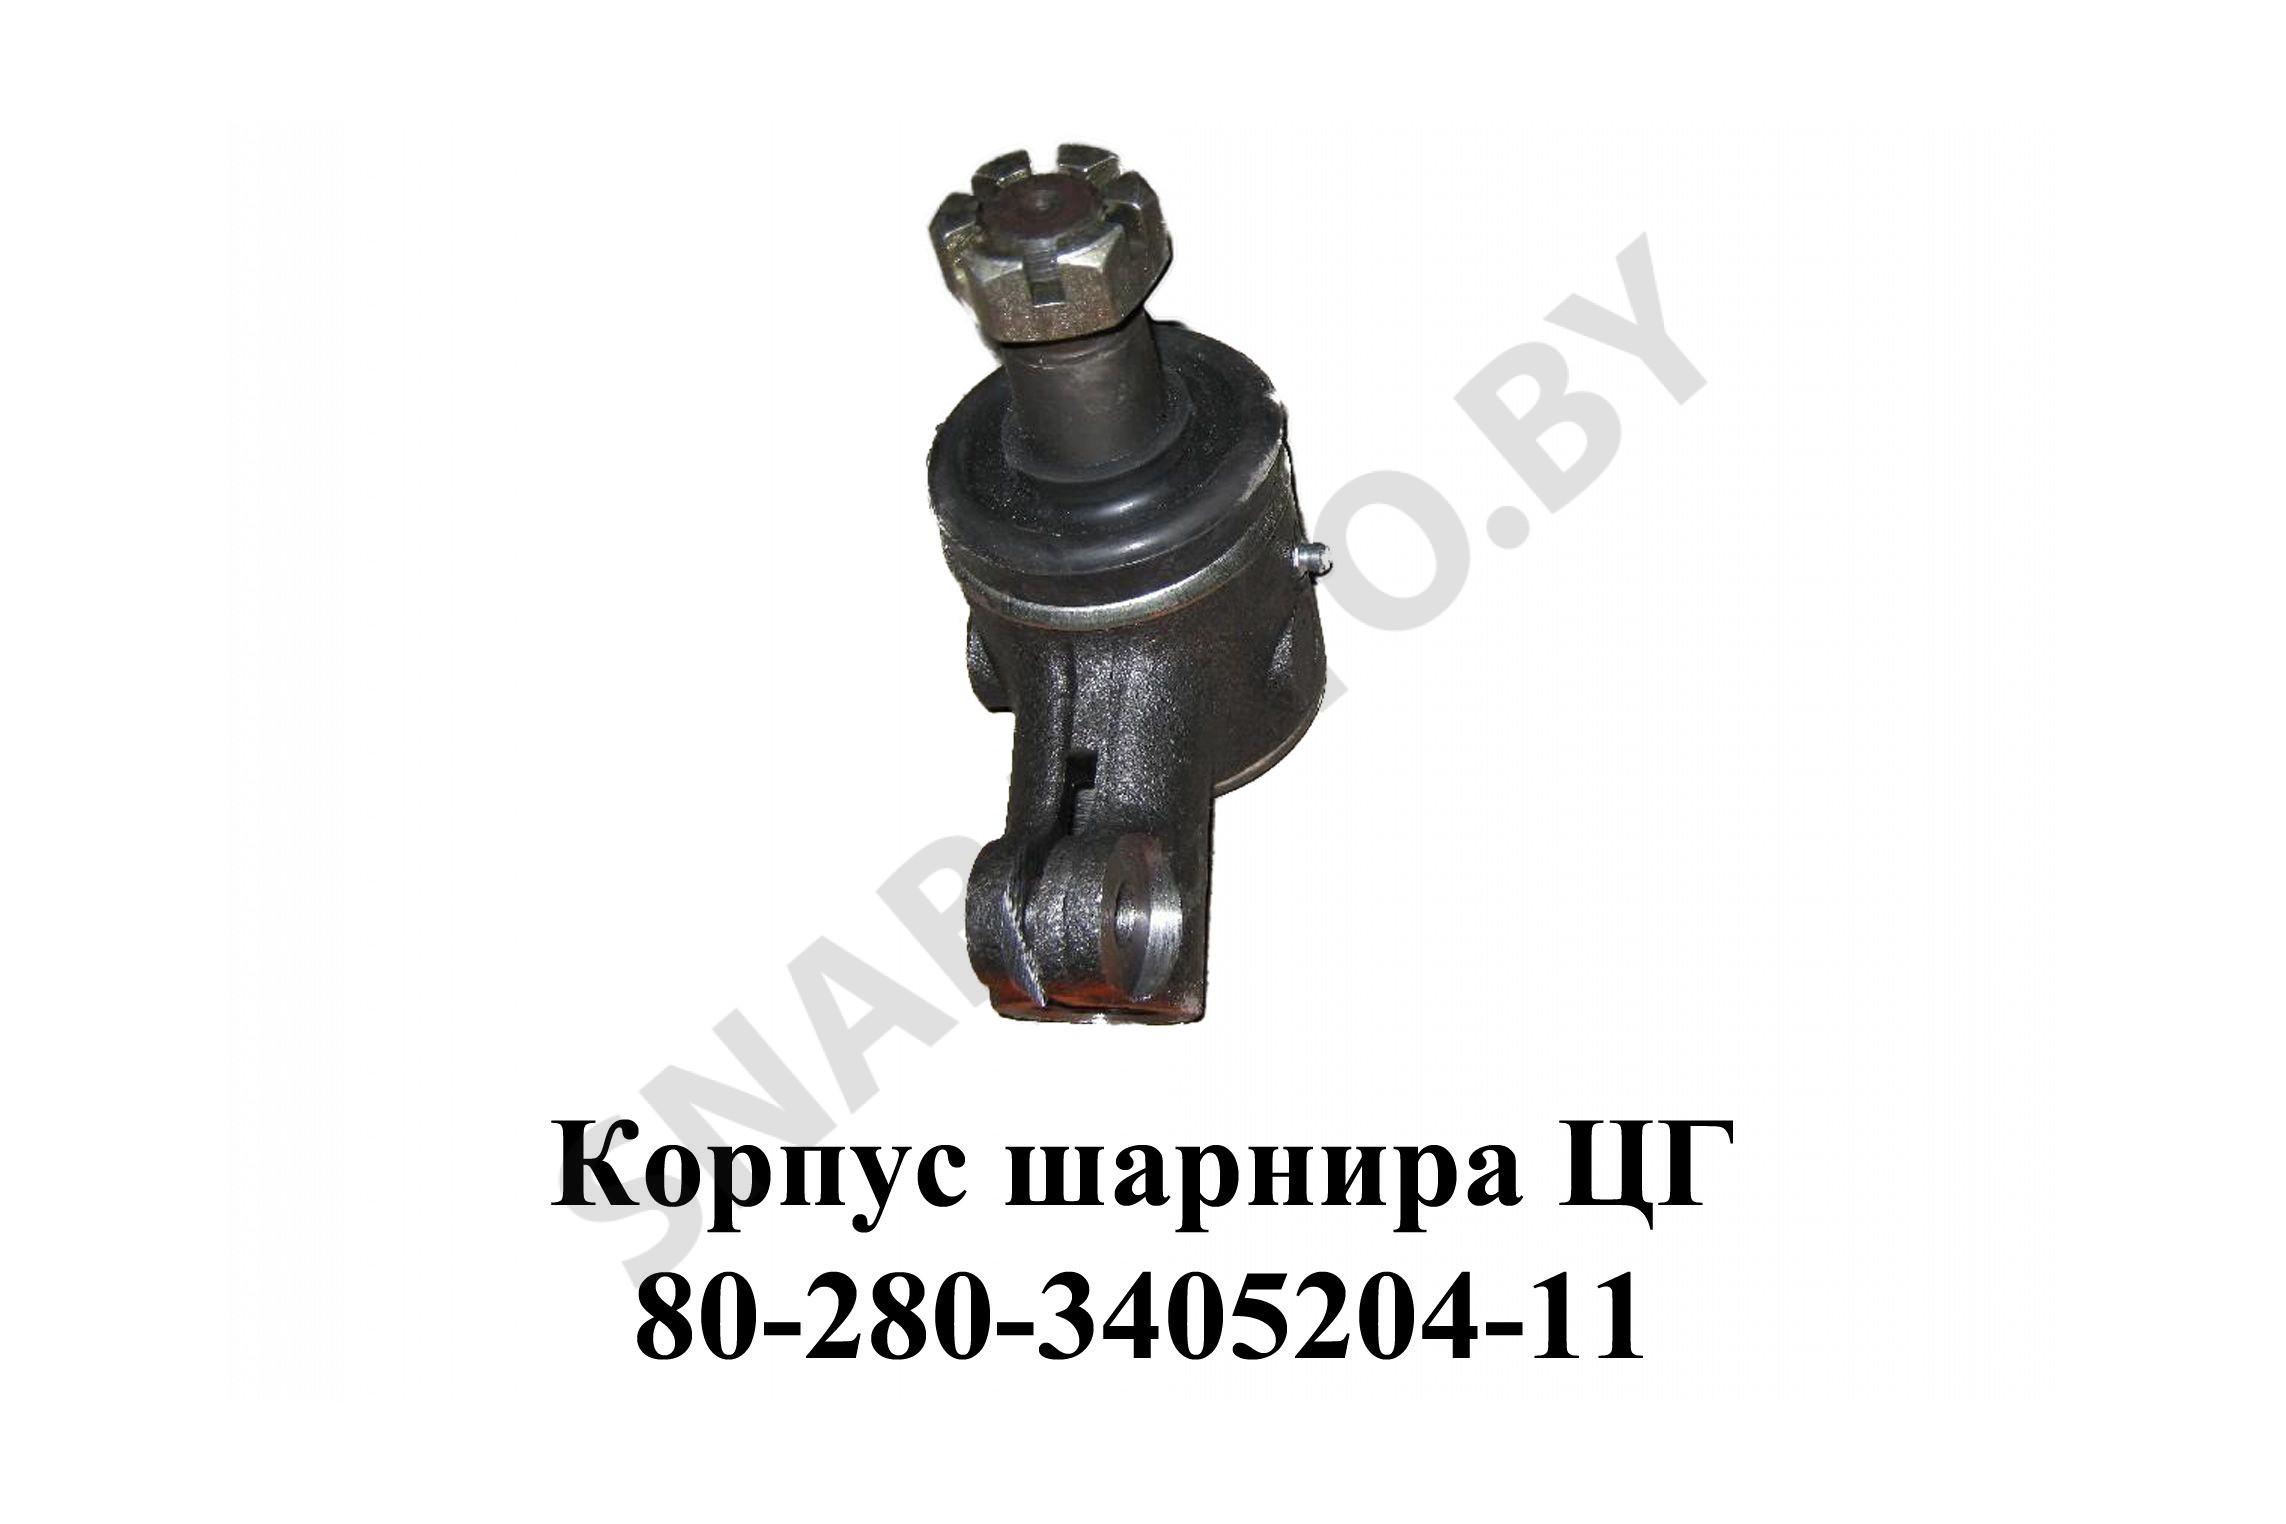 ЦГ 80-280-3405204-11